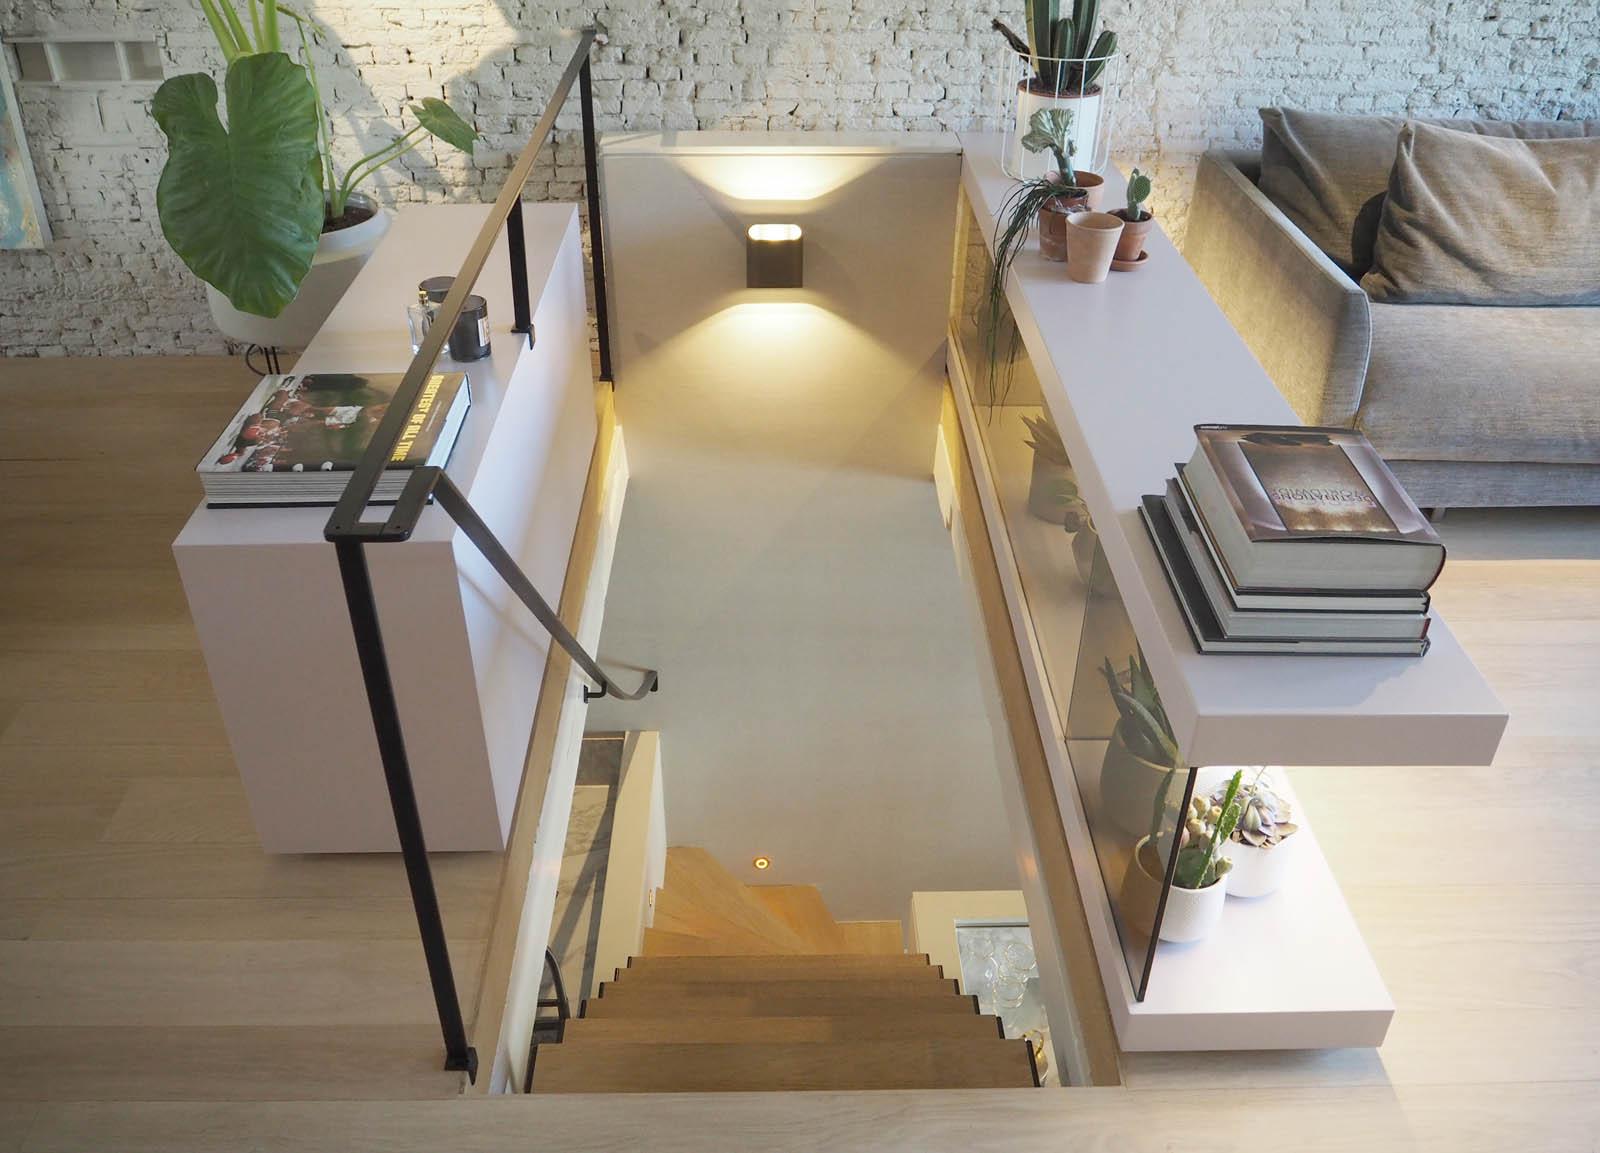 jordaan_amsterdam_grachtenpand_stair_pink_jeroen_de_nijs_bni